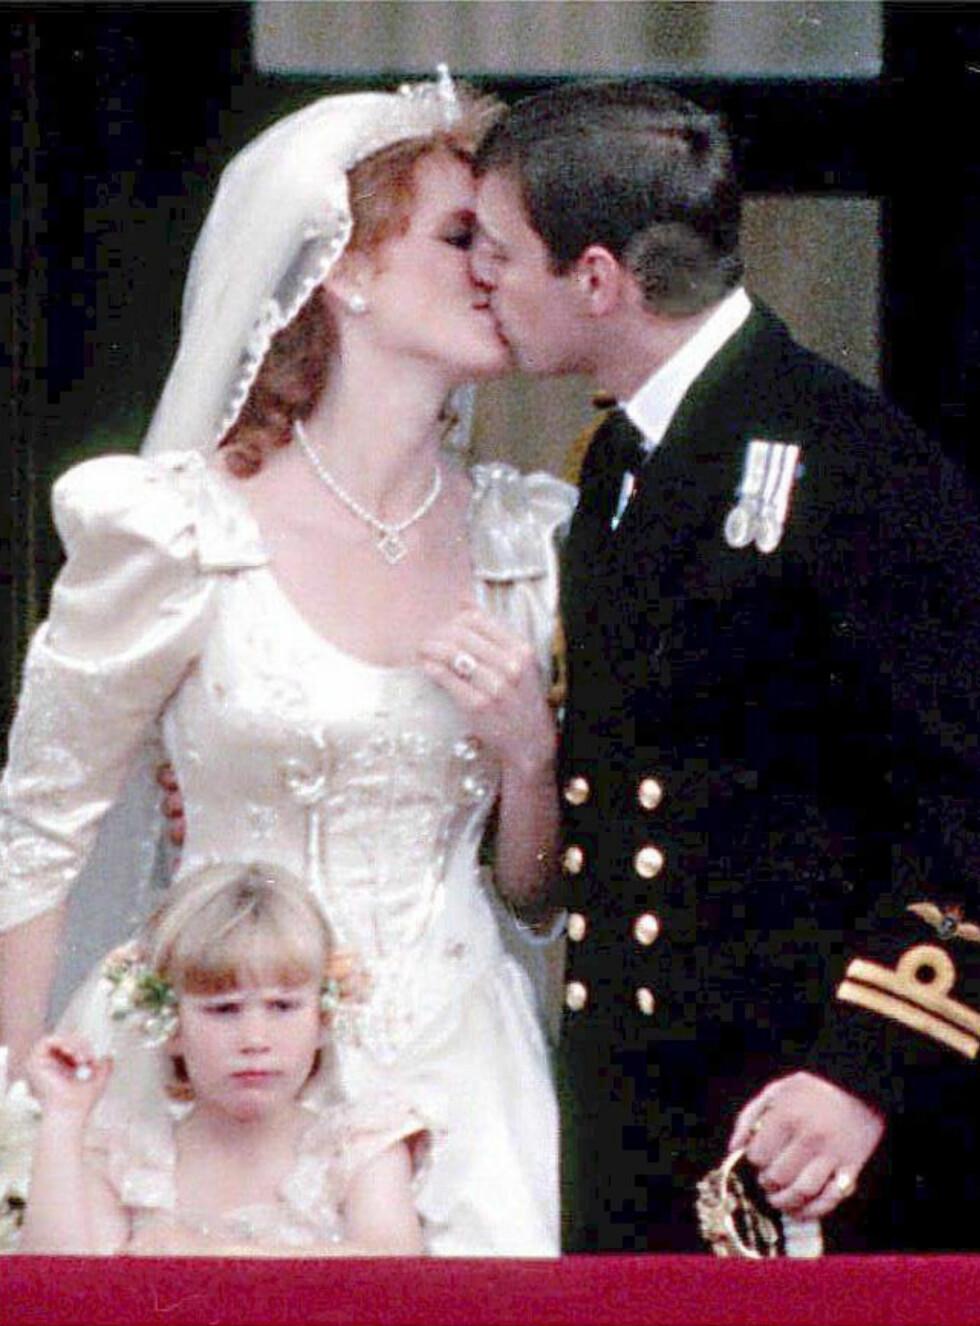 KYSSET: Det nygifte ekteparet kysset på balkongen til ellevill jubel fra folket som hadde samlet seg foran Buckingham Palace. Den lille brudepiken på første rad er Zara Phillips. Hun er i dag 35 år. Foto: NTB Scanpix